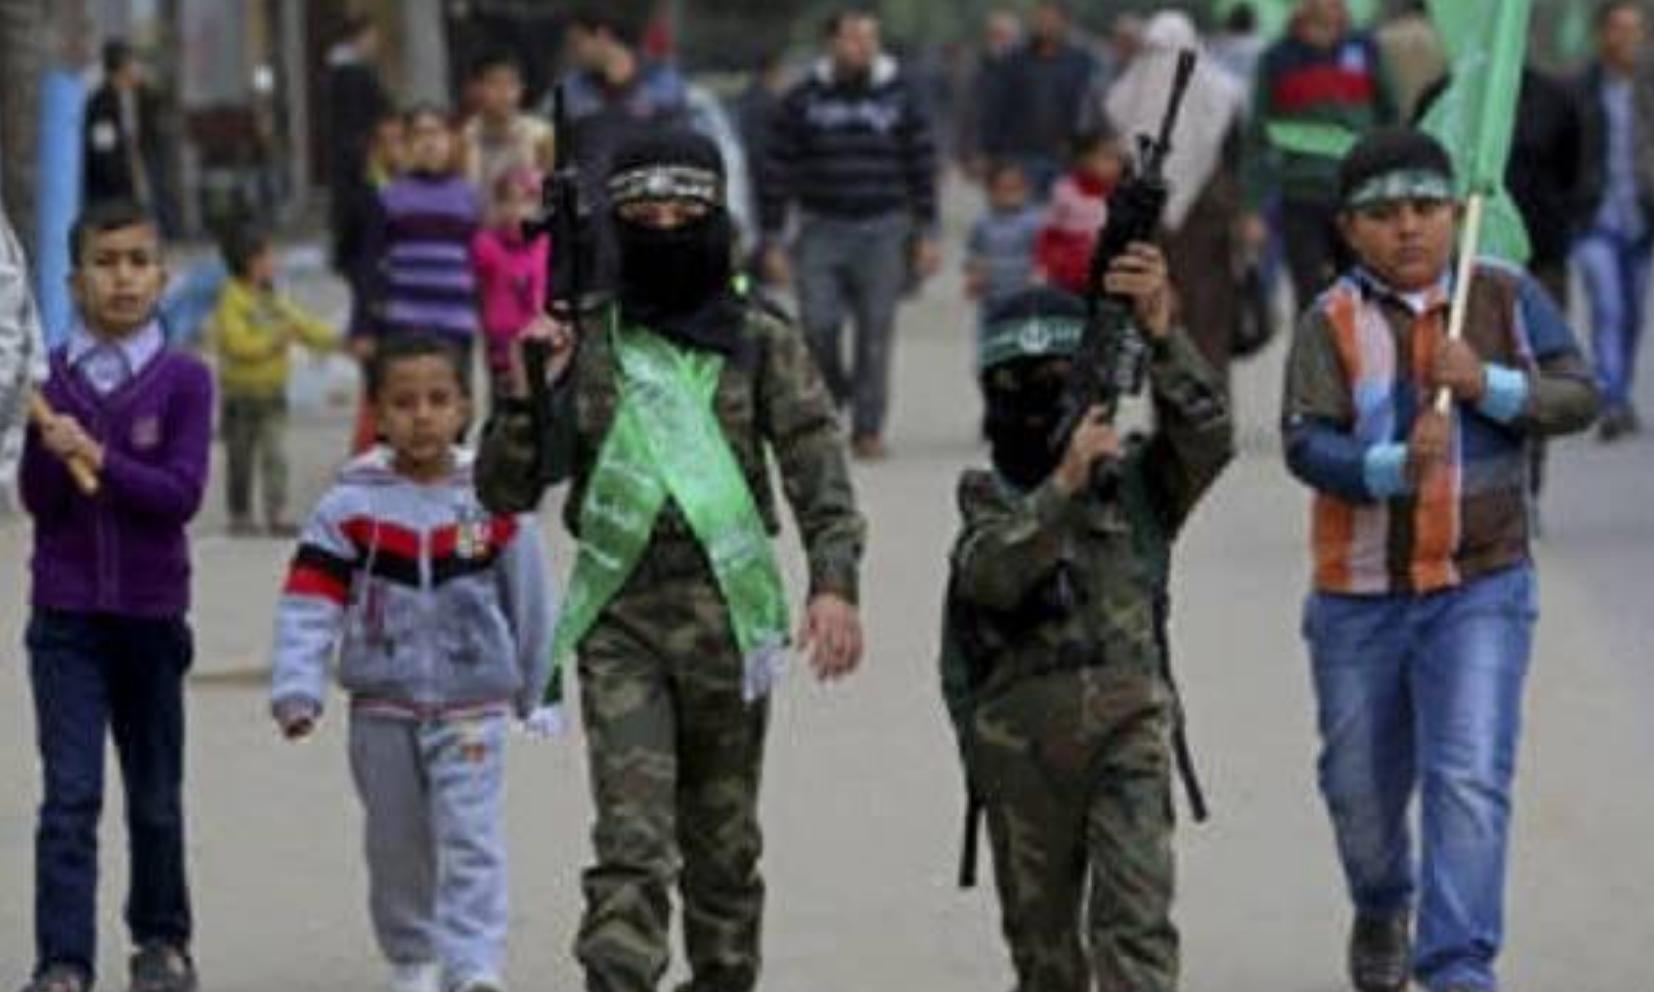 Palestinian Children Dressed as Terrorists